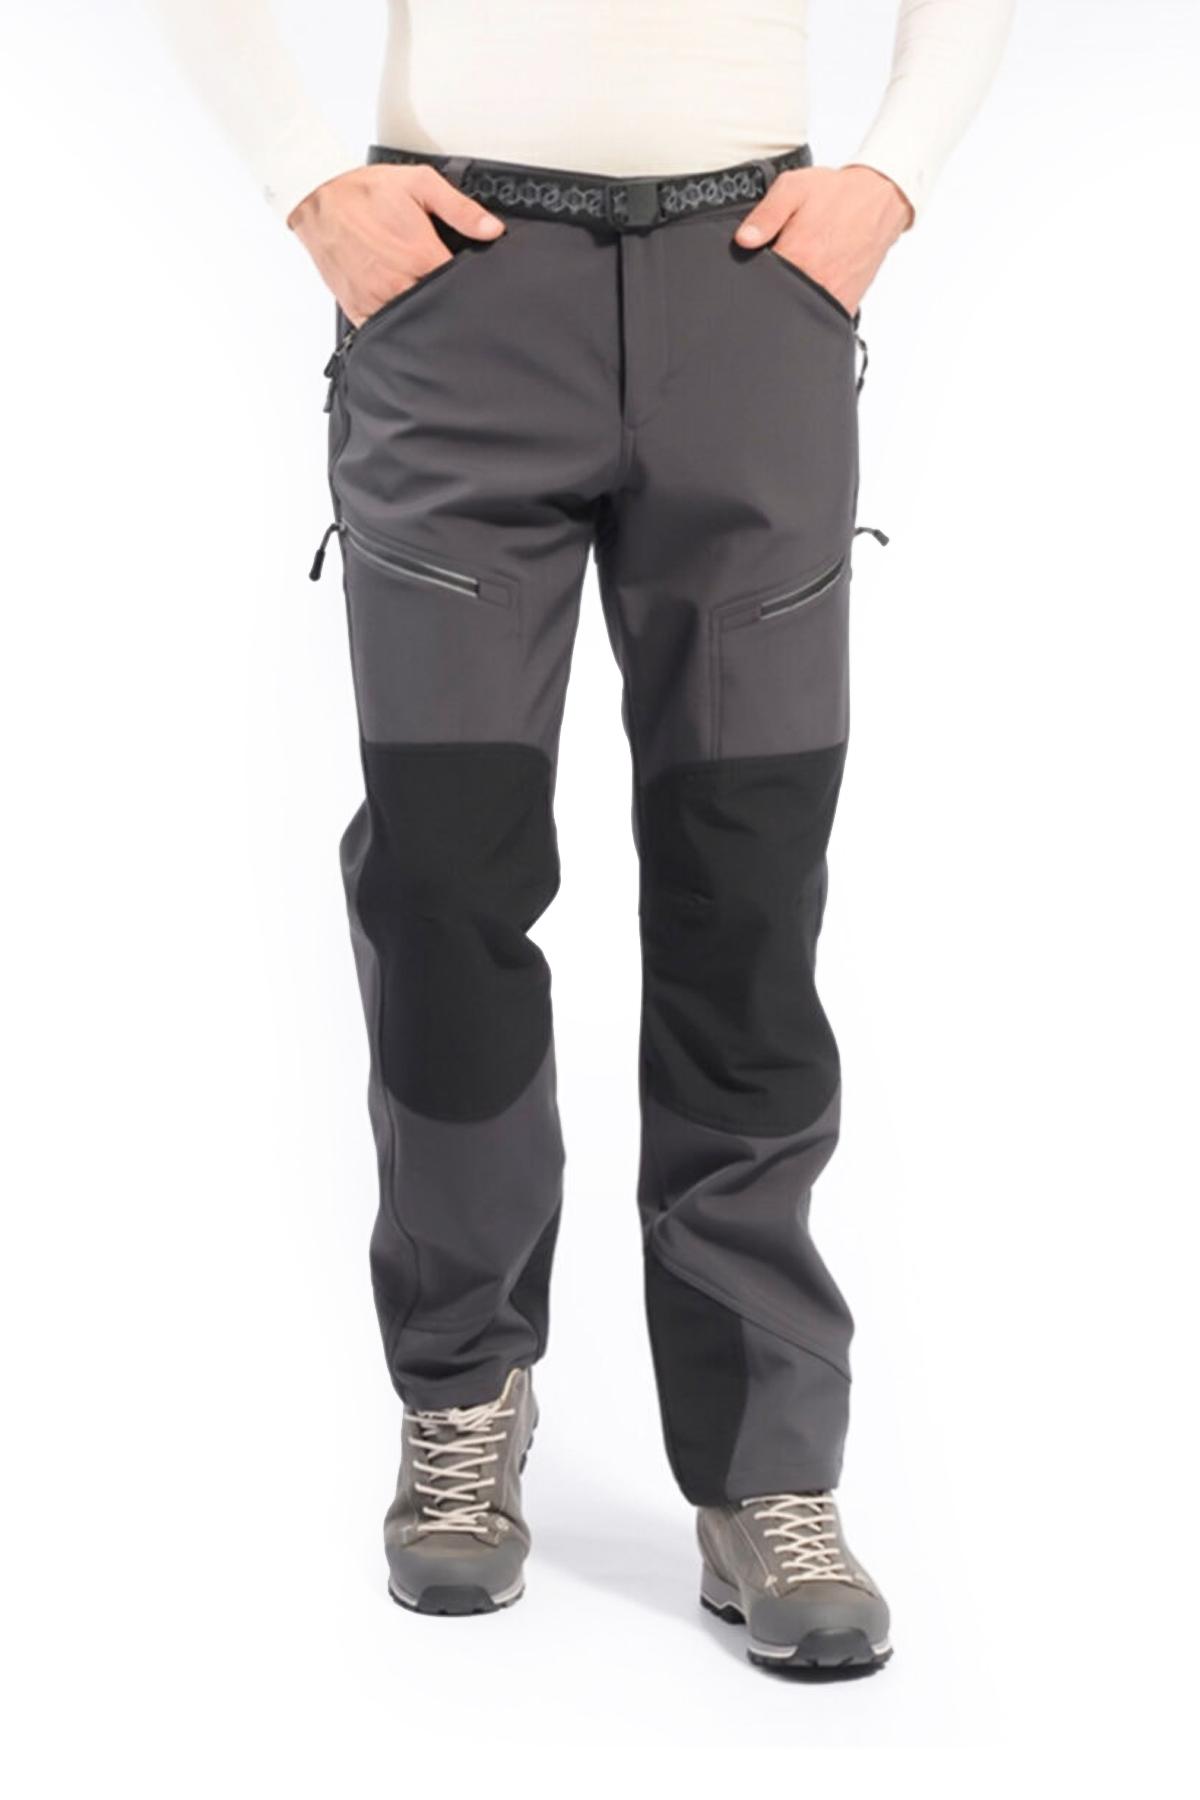 FREECAMP Kalalu Trekking Pantolon Antrasit (105139-ART)